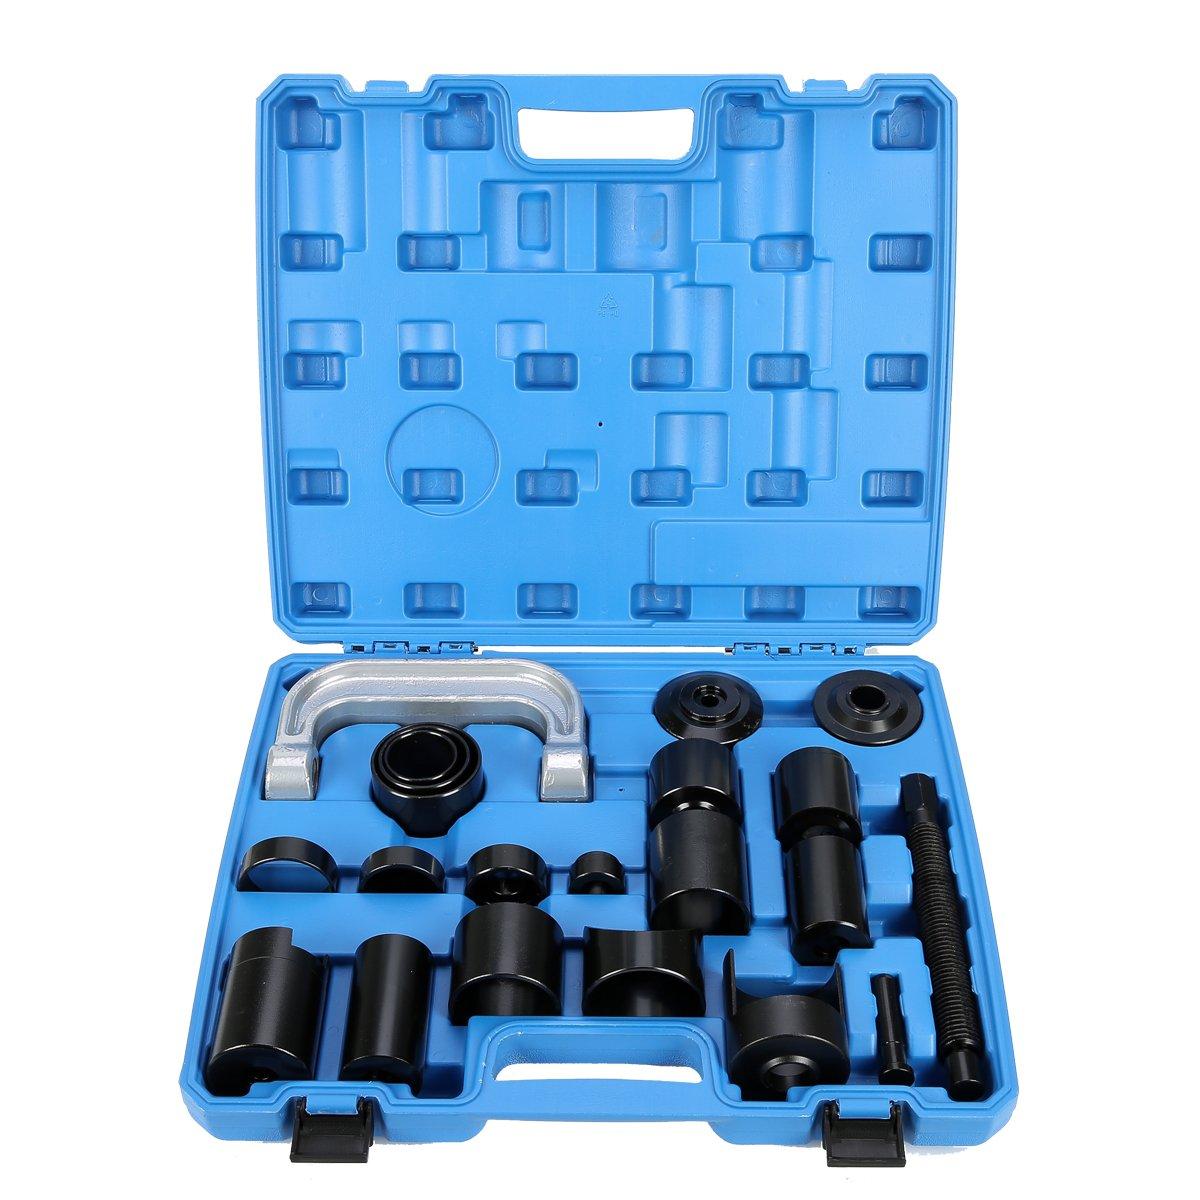 8milelake Universal 21PCS Ball Joint Repair Service Removal Tool Kit Remover Installer Master Adapter Set freebirdtrading